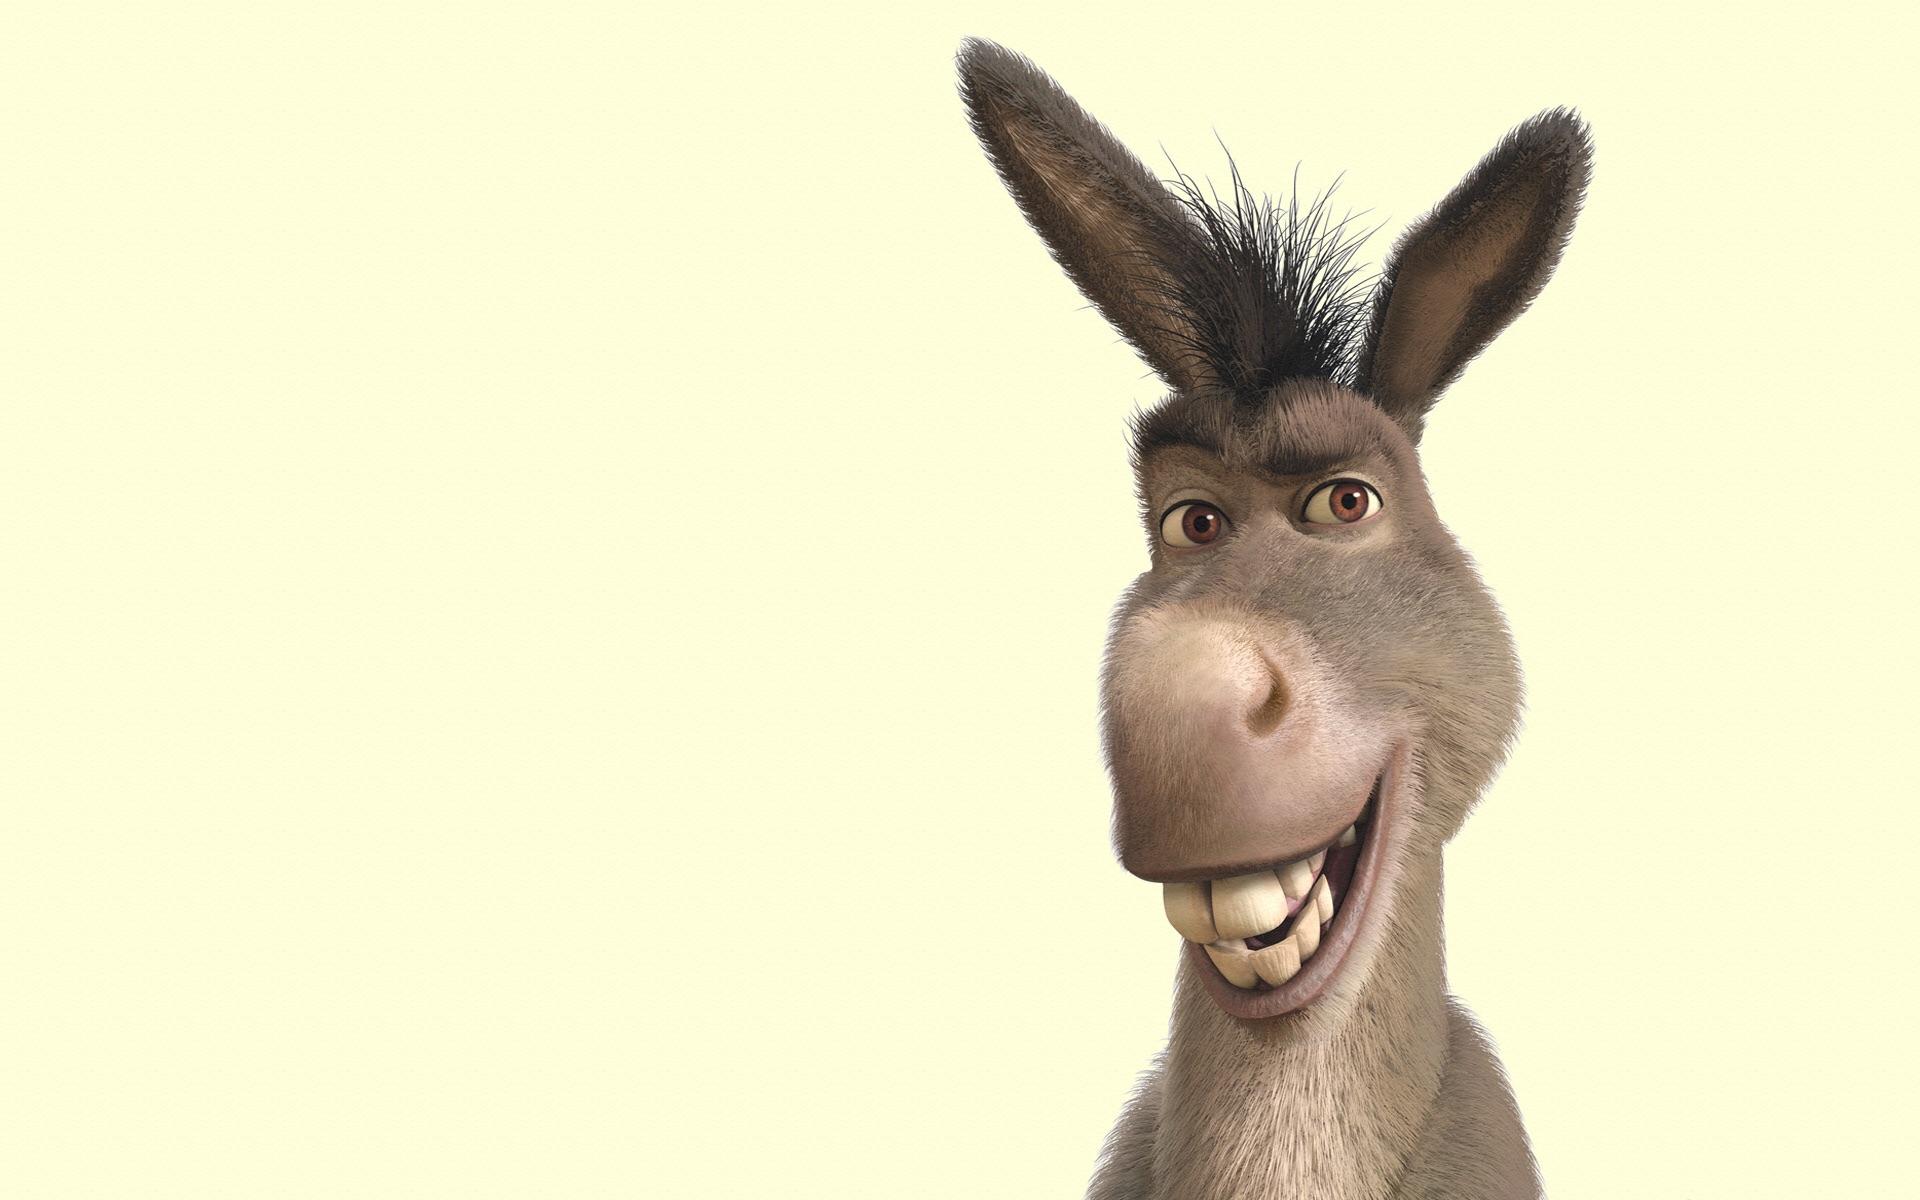 Donkey Blank Template - Imgflip